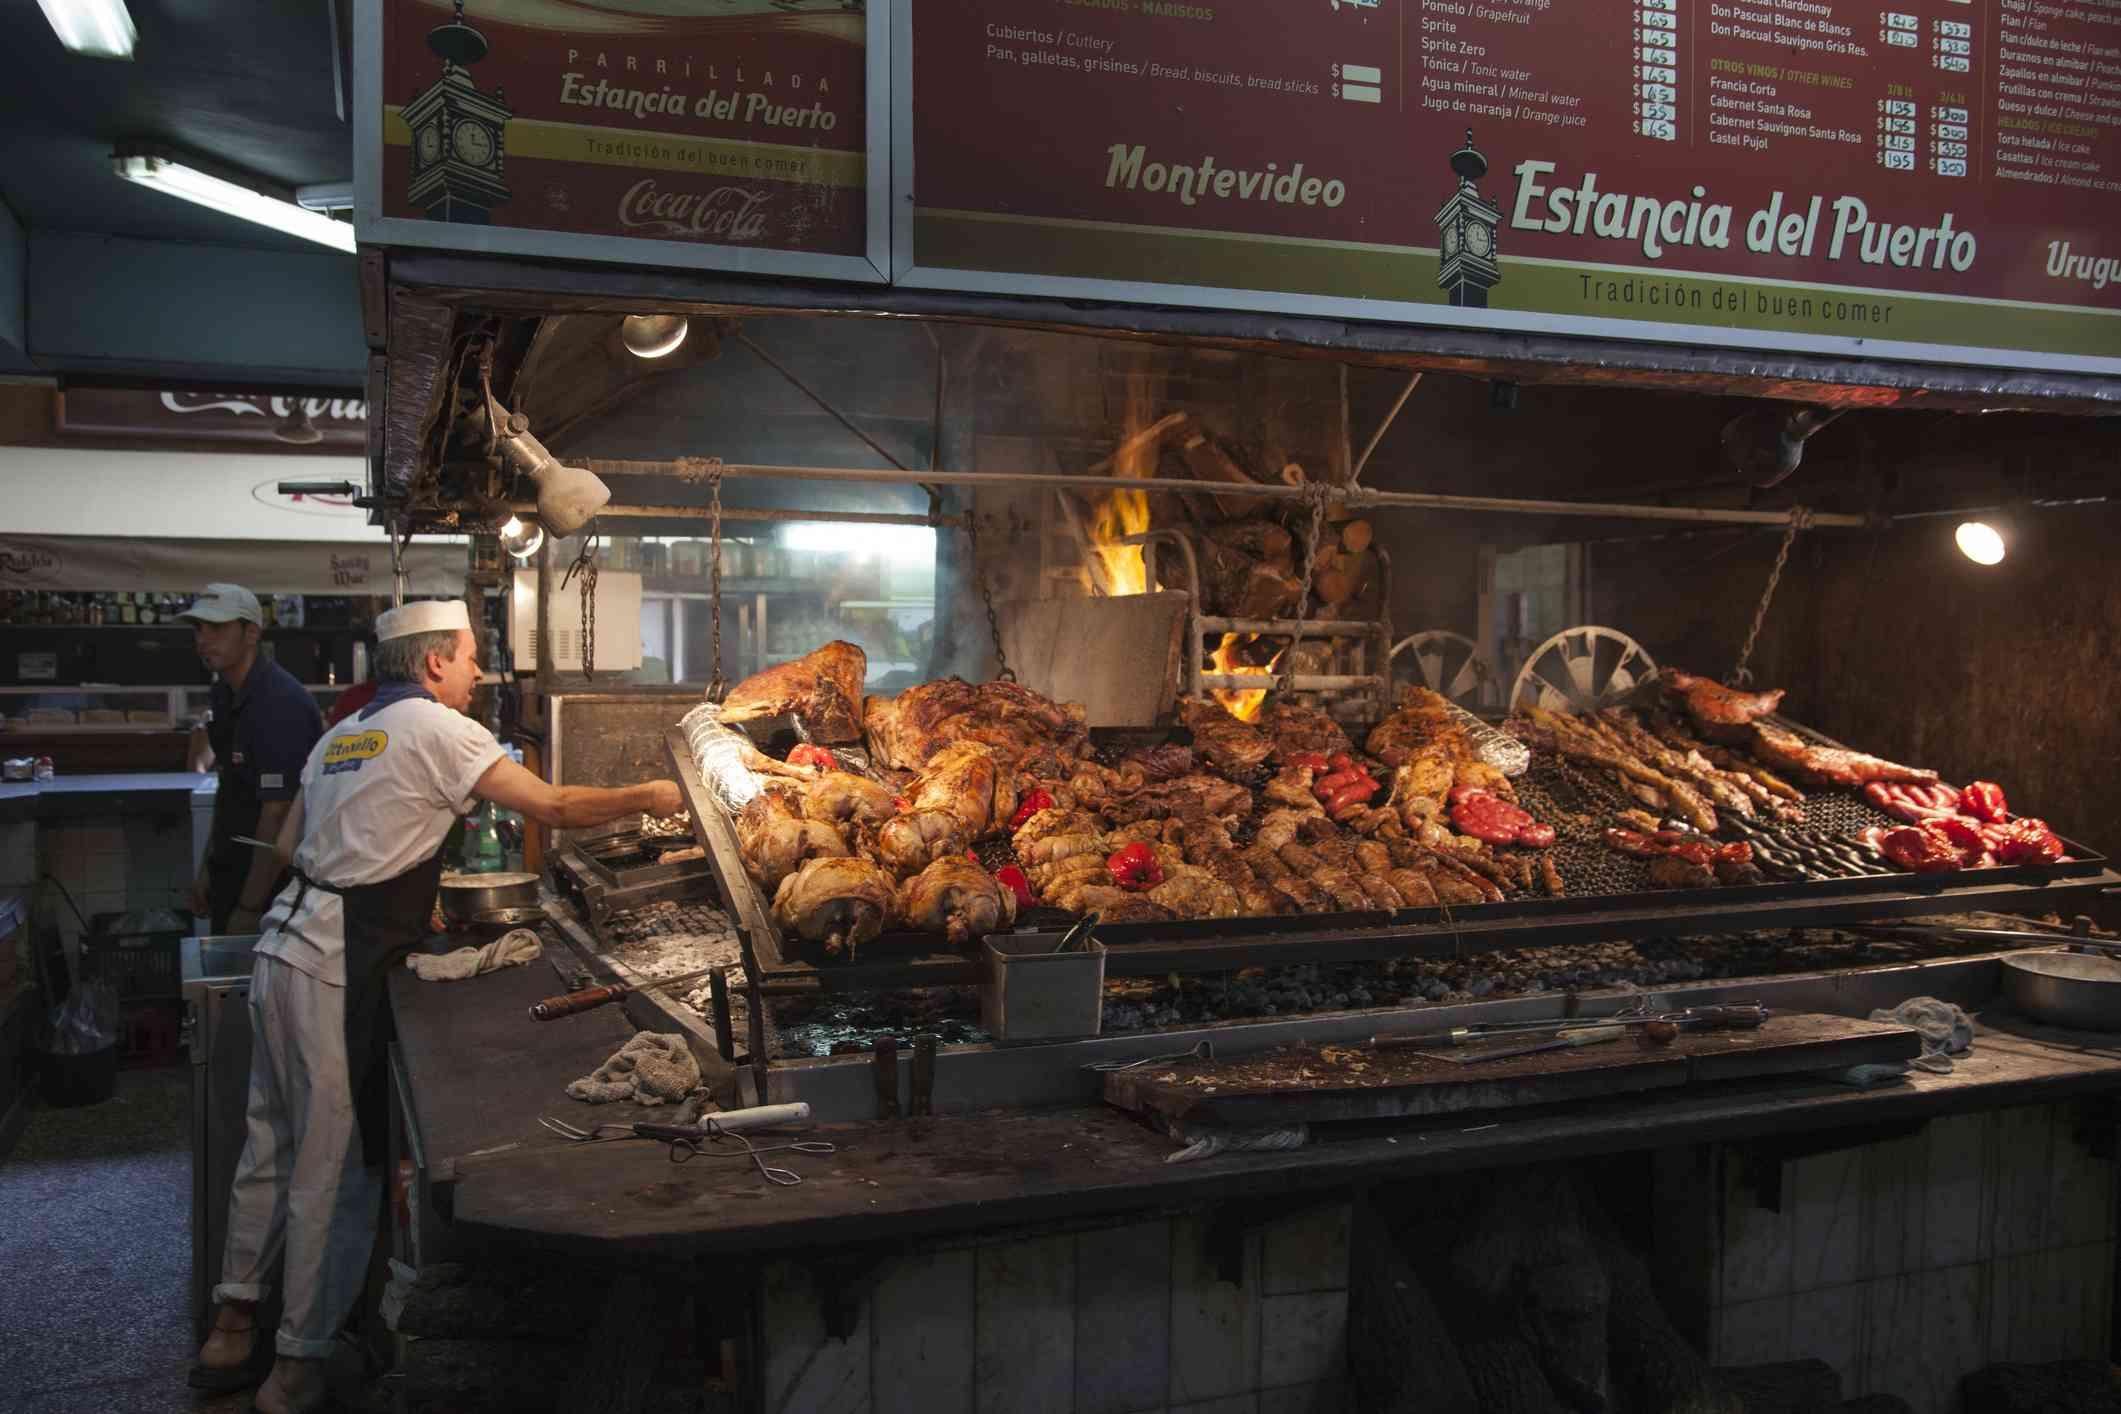 Chef grills steak and meat at Estancia del Puerto Parrilla type restaurant in Mercado del Puerto, ol